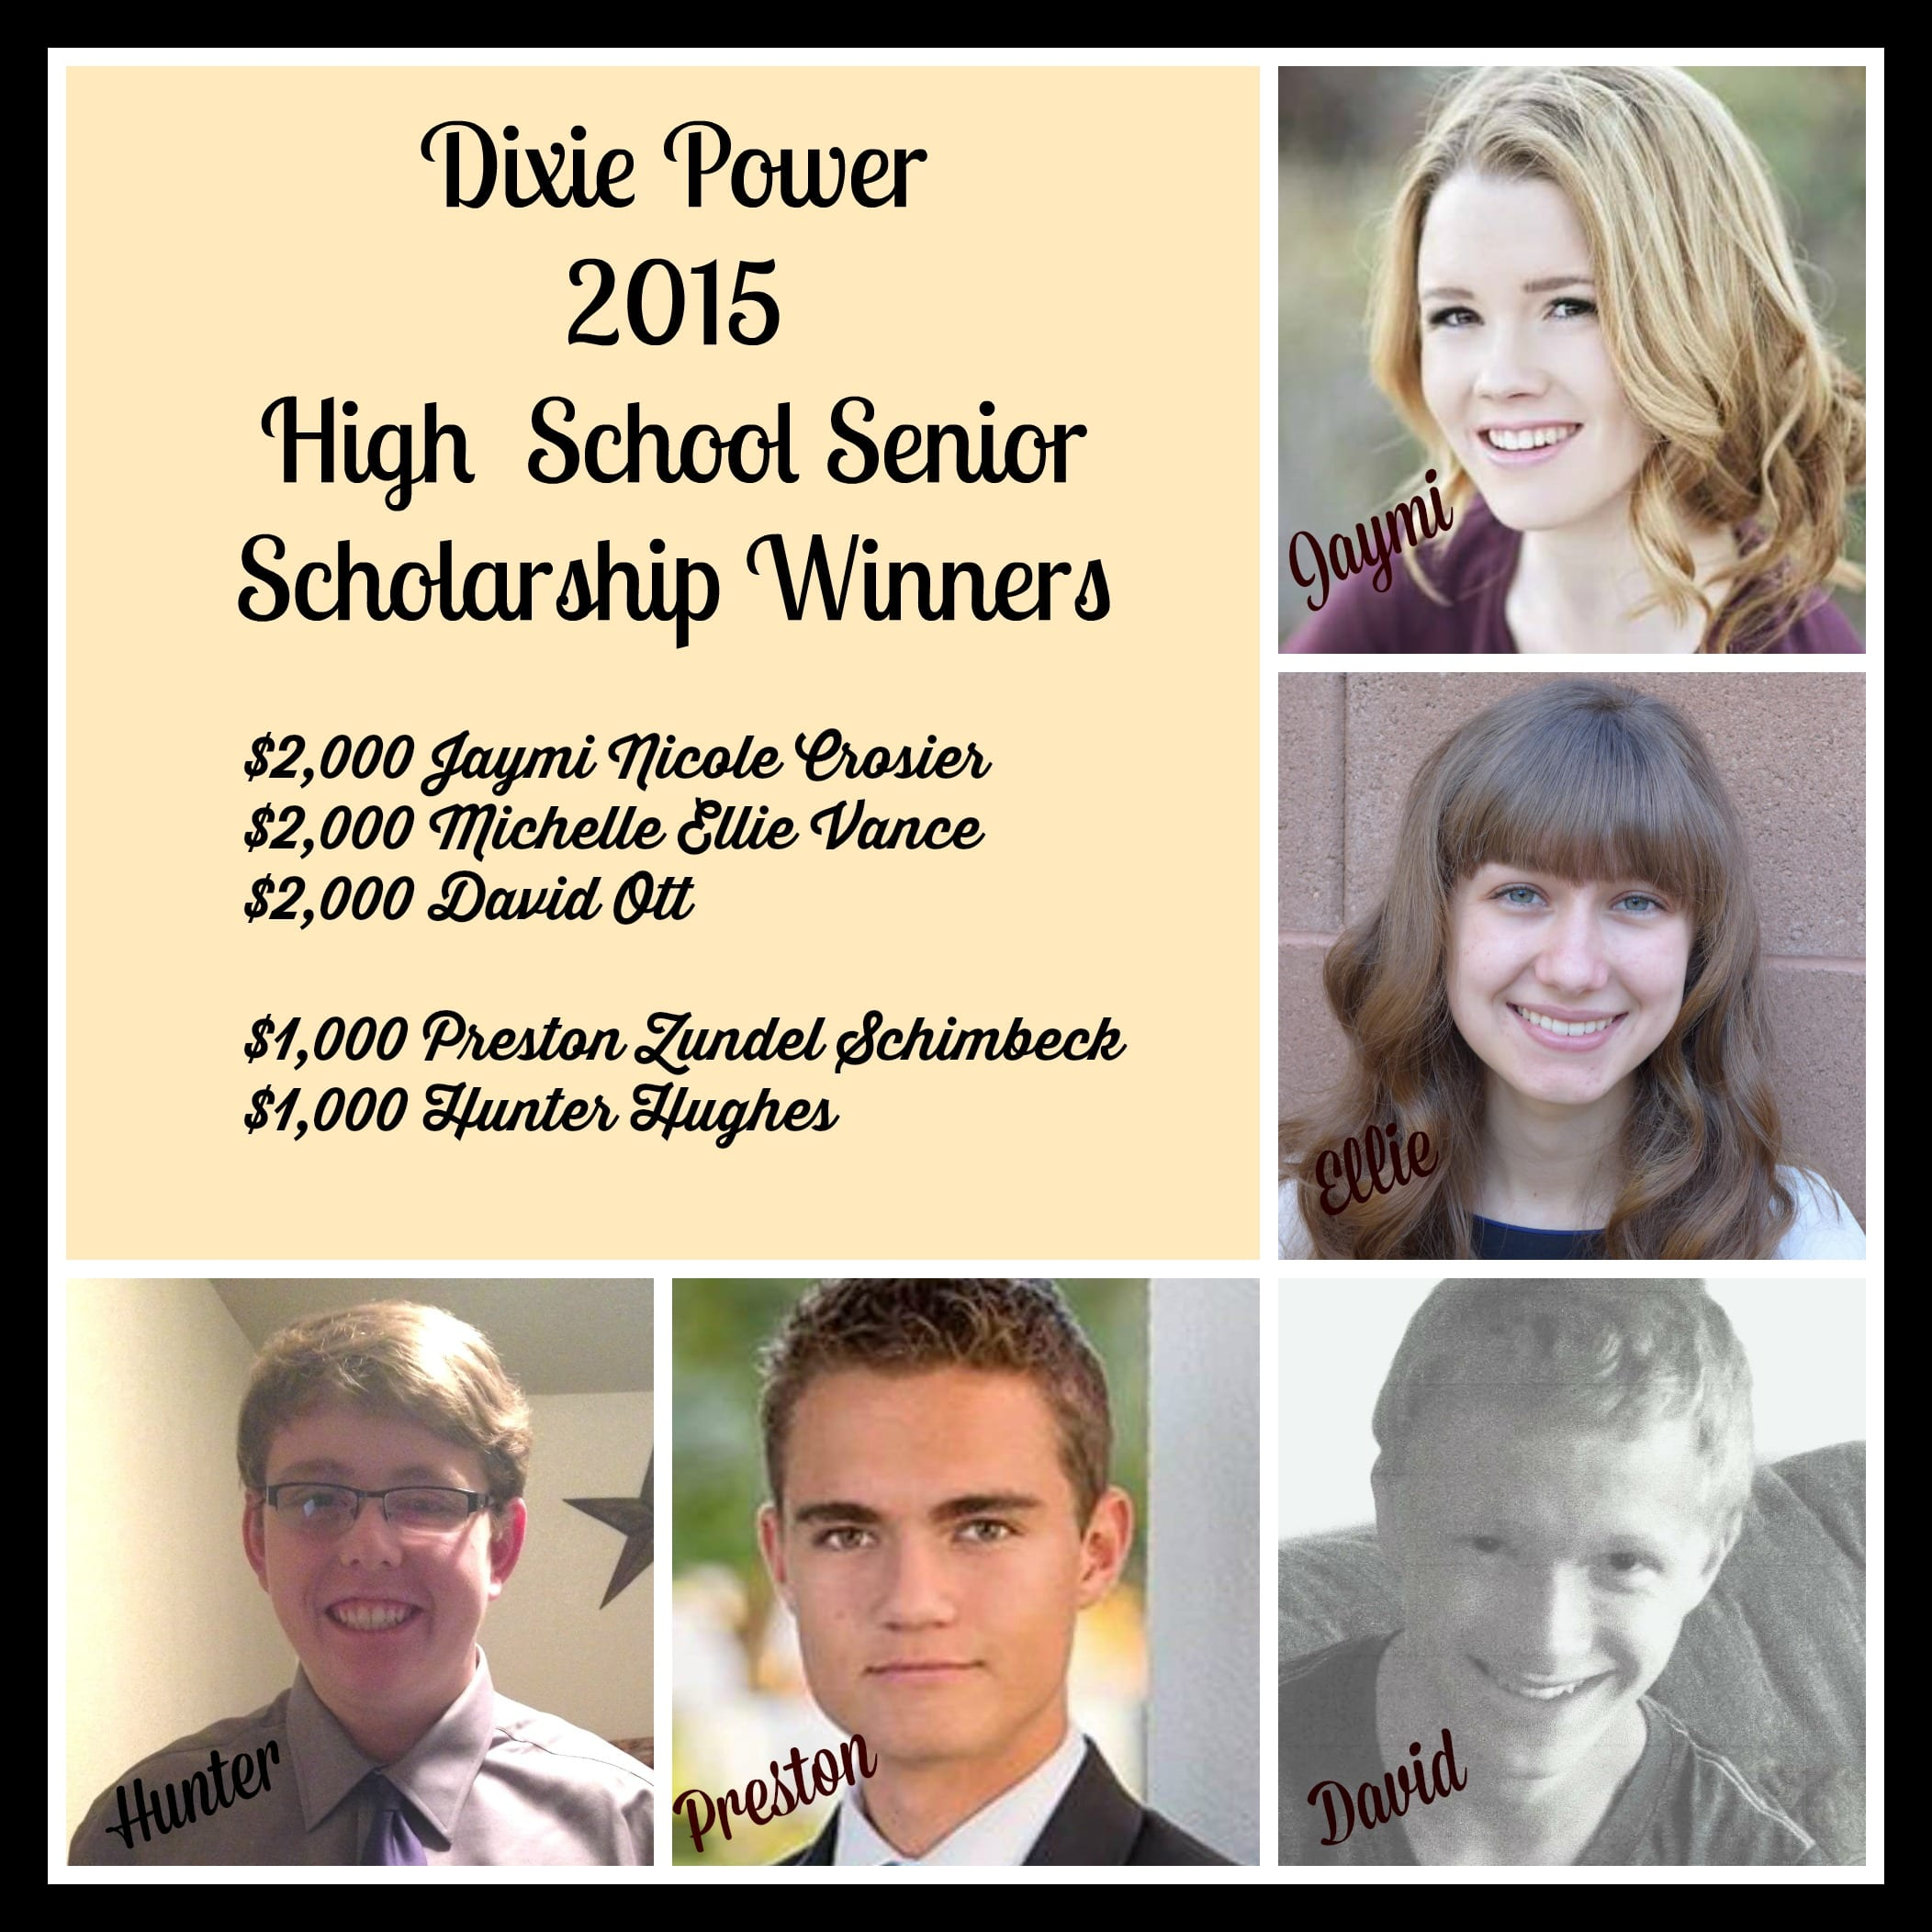 High school essay scholarships 2014